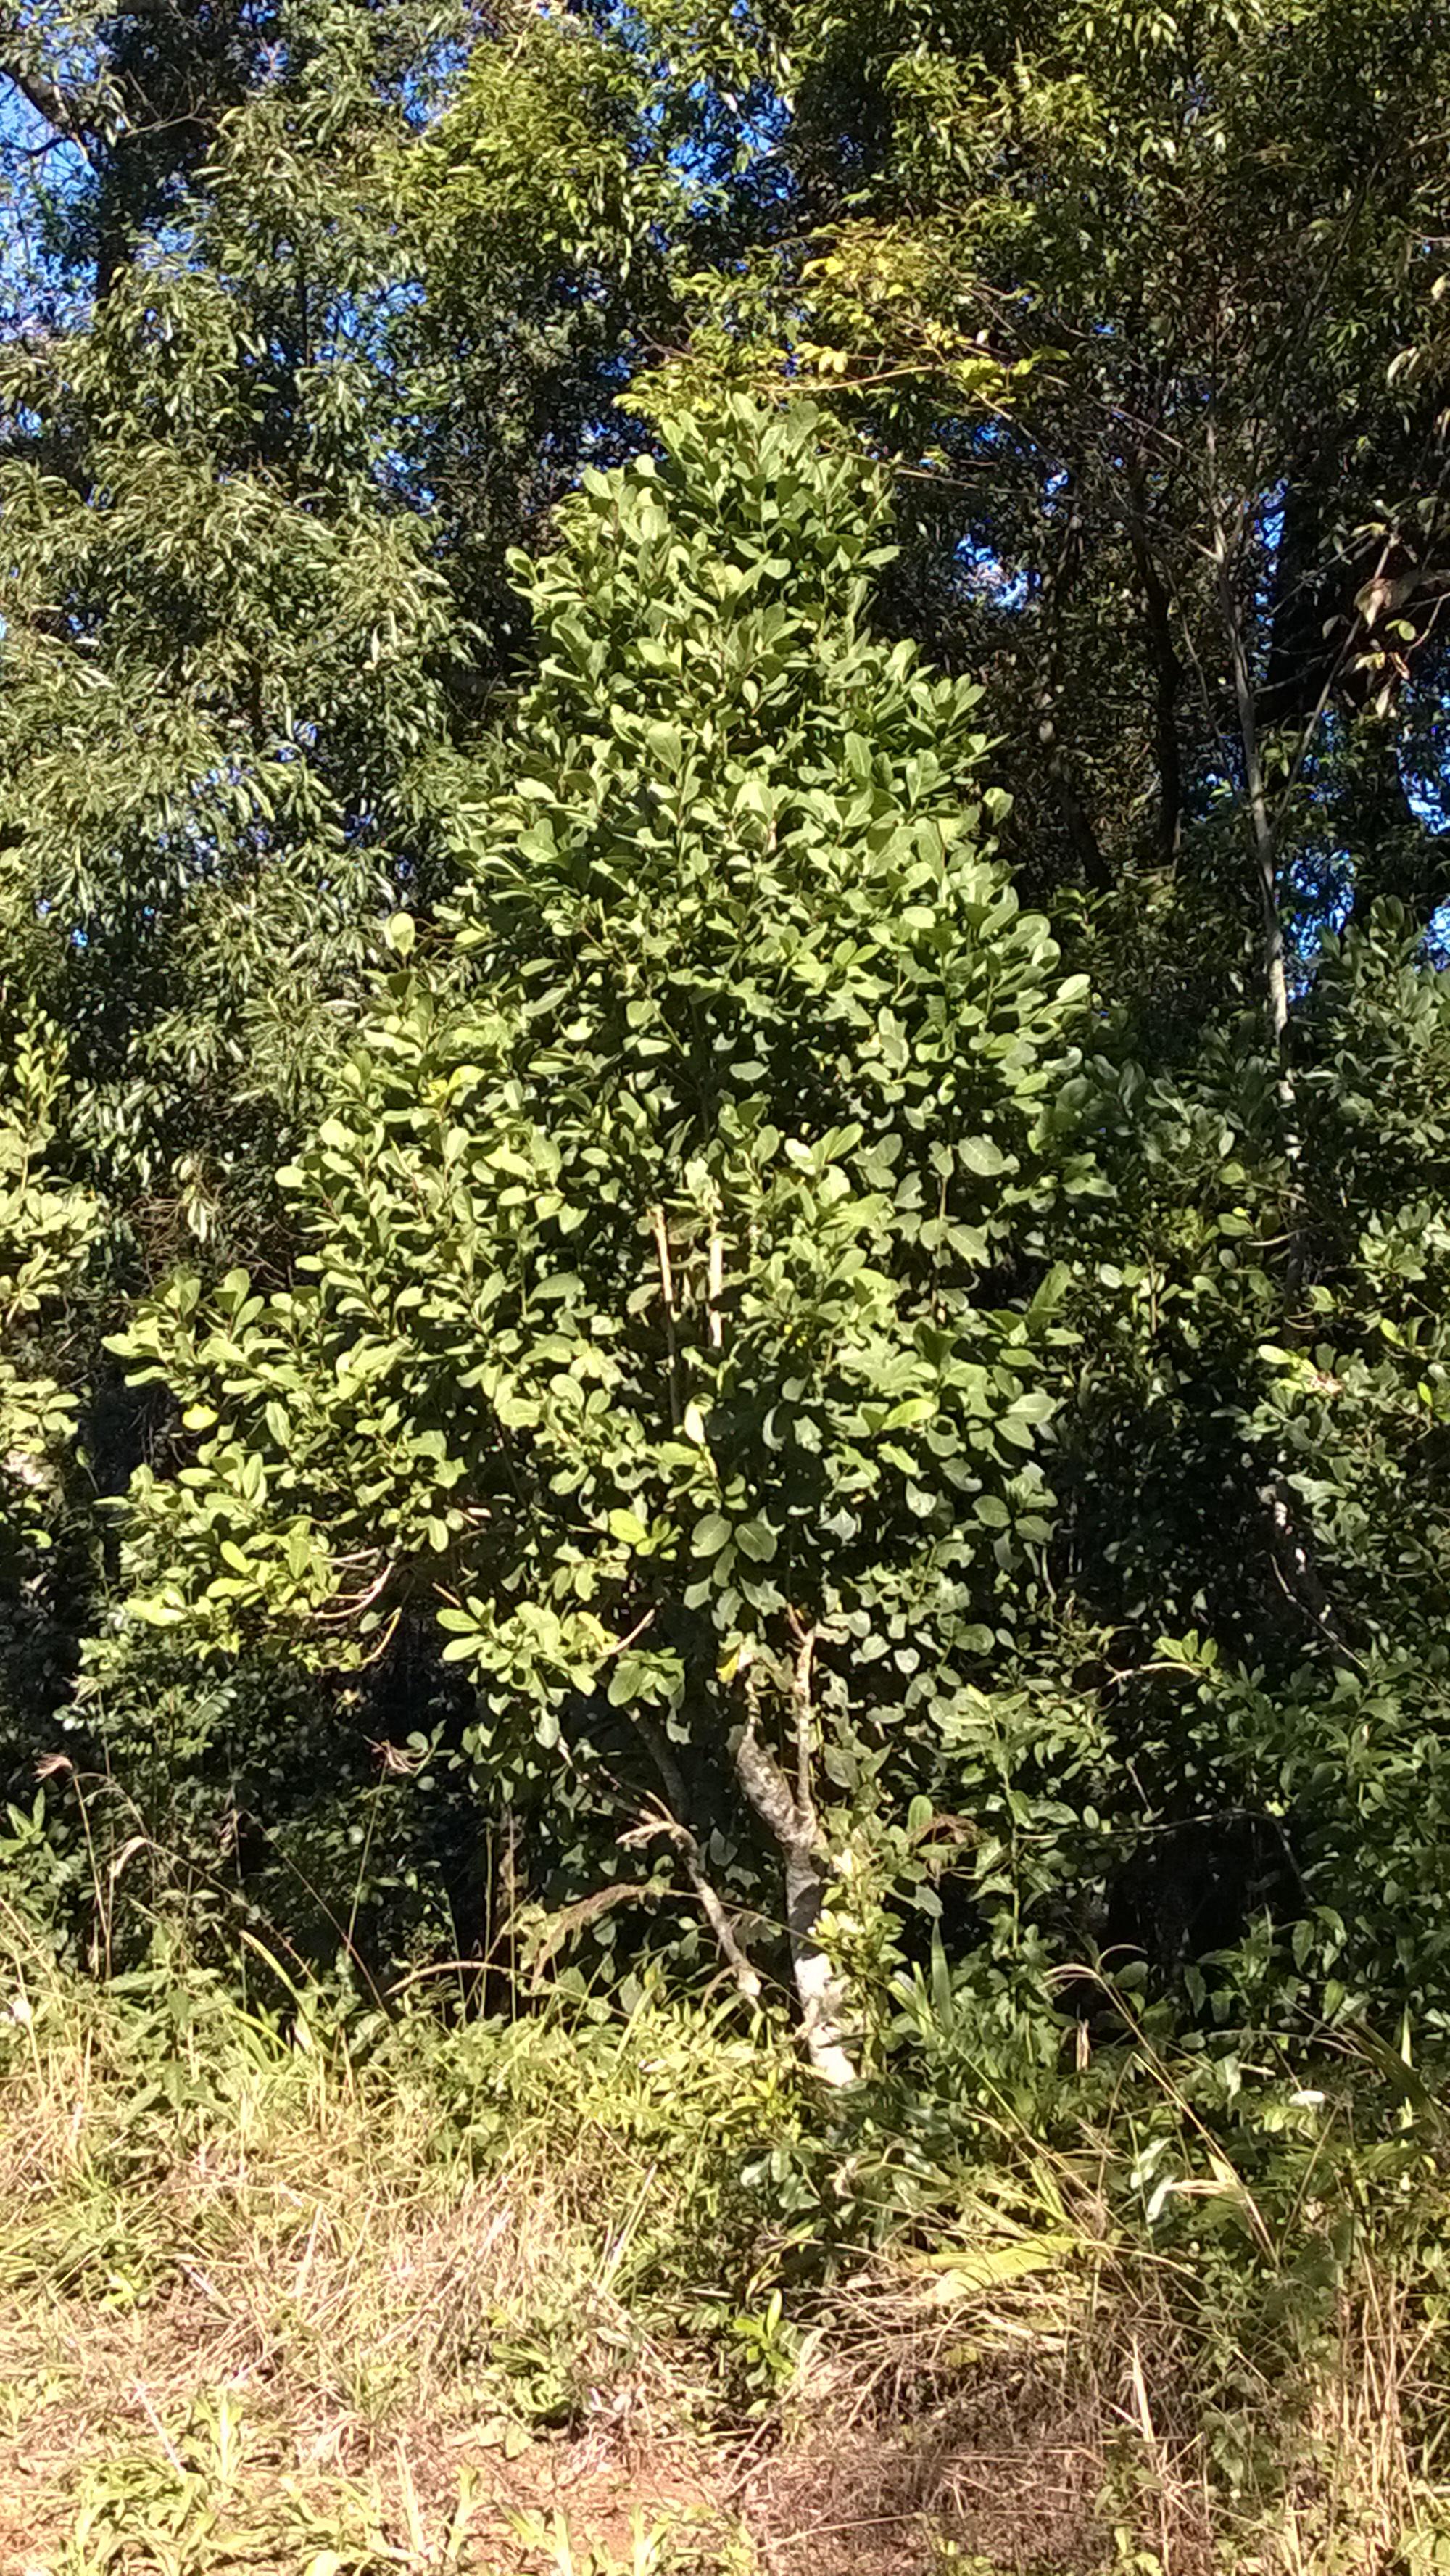 Wild yerba mate plant growing